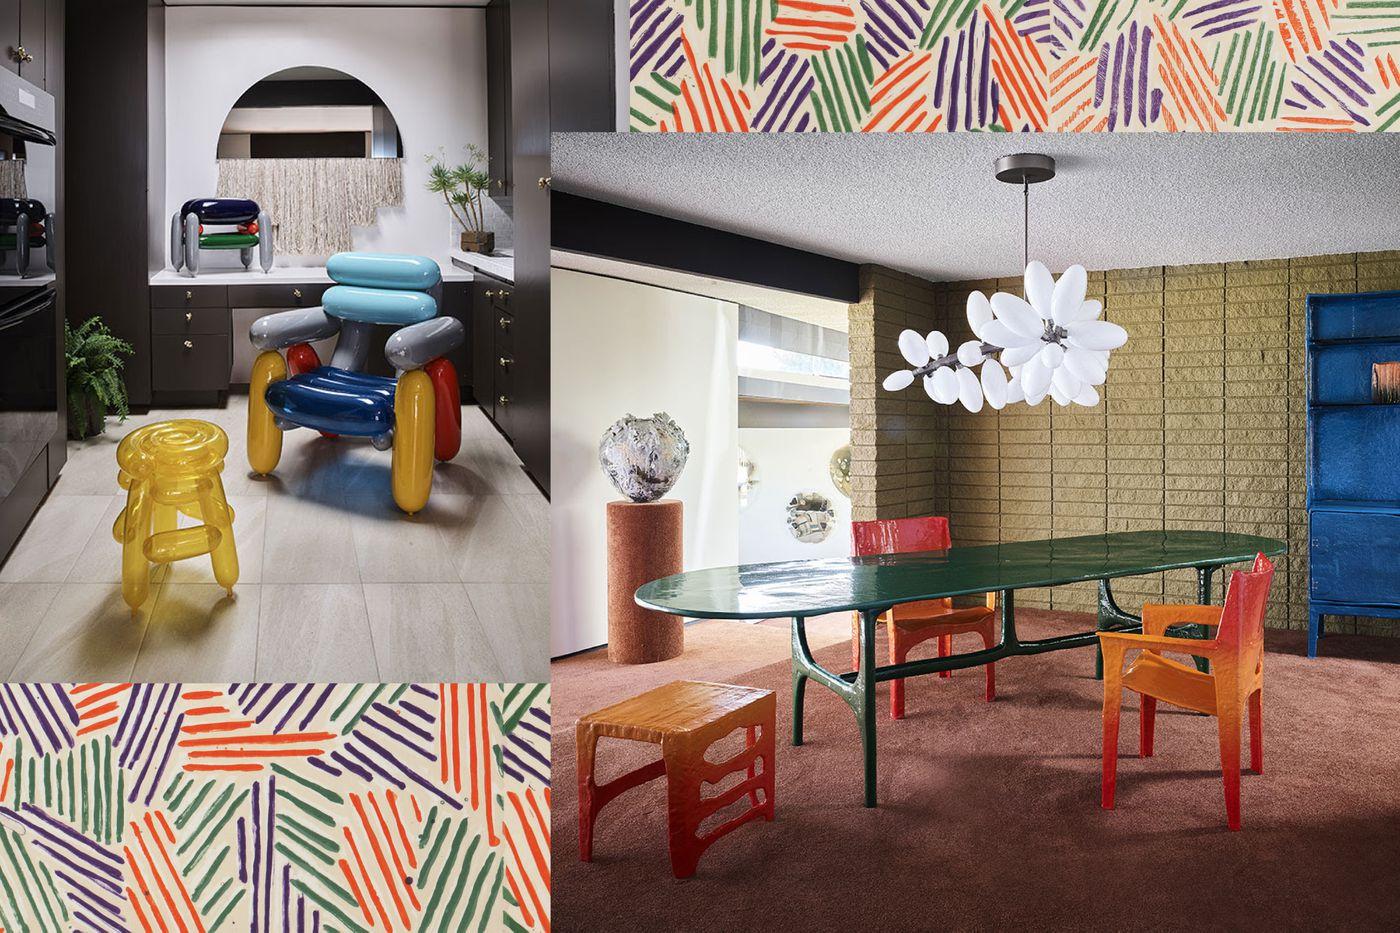 cultural appropriation in interior designers